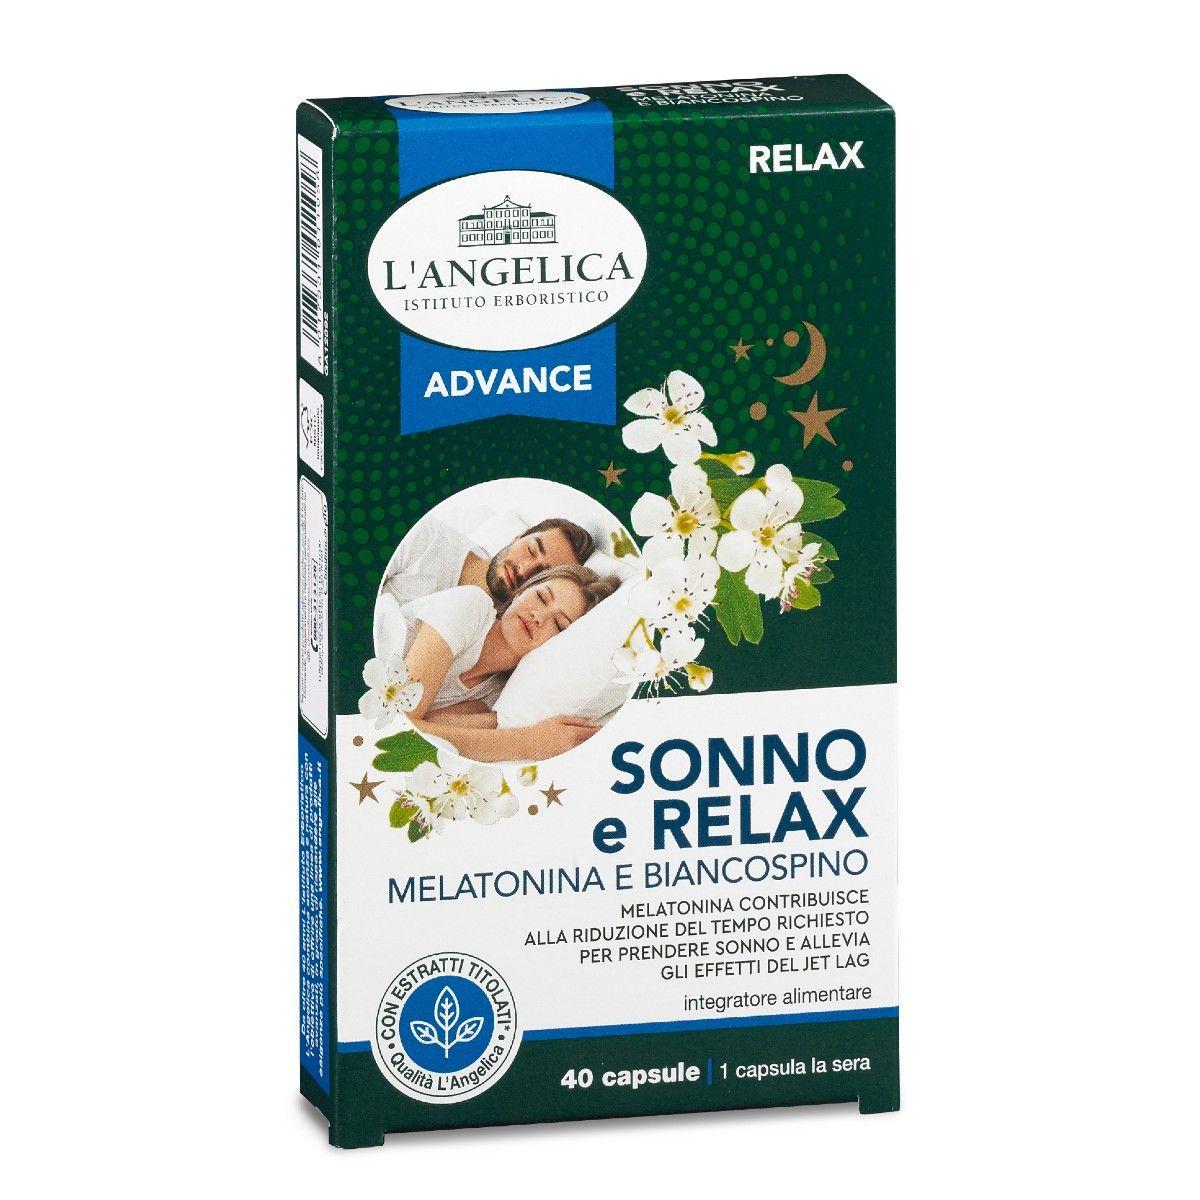 SONNO E RELAX Melatonina e Biancospino